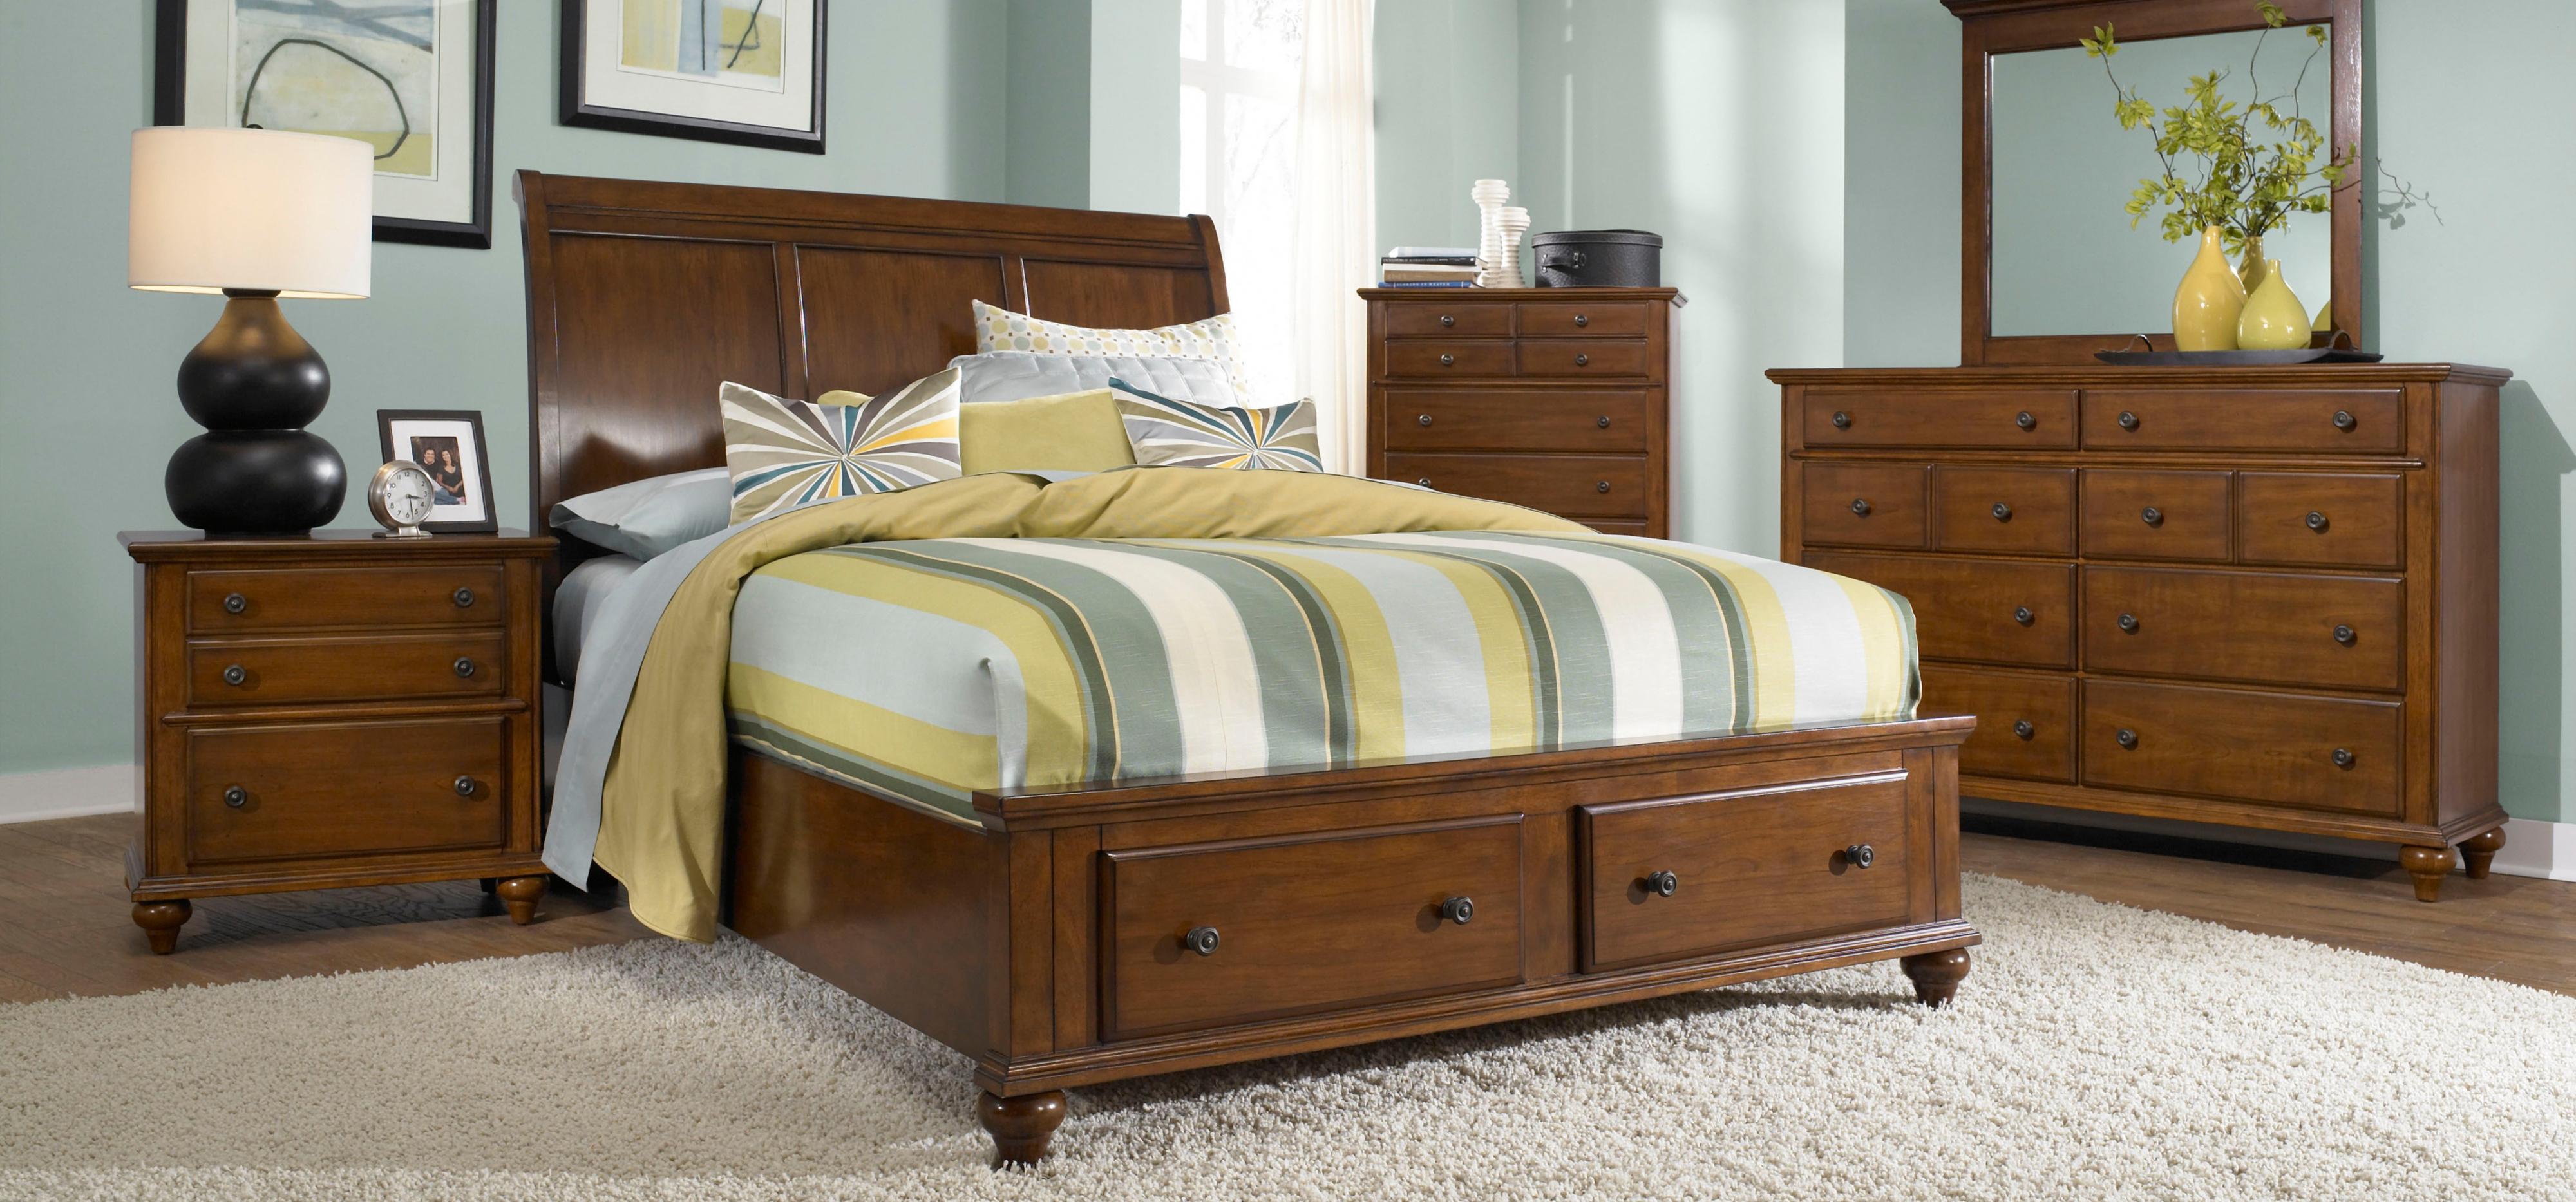 Broyhill Bedroom